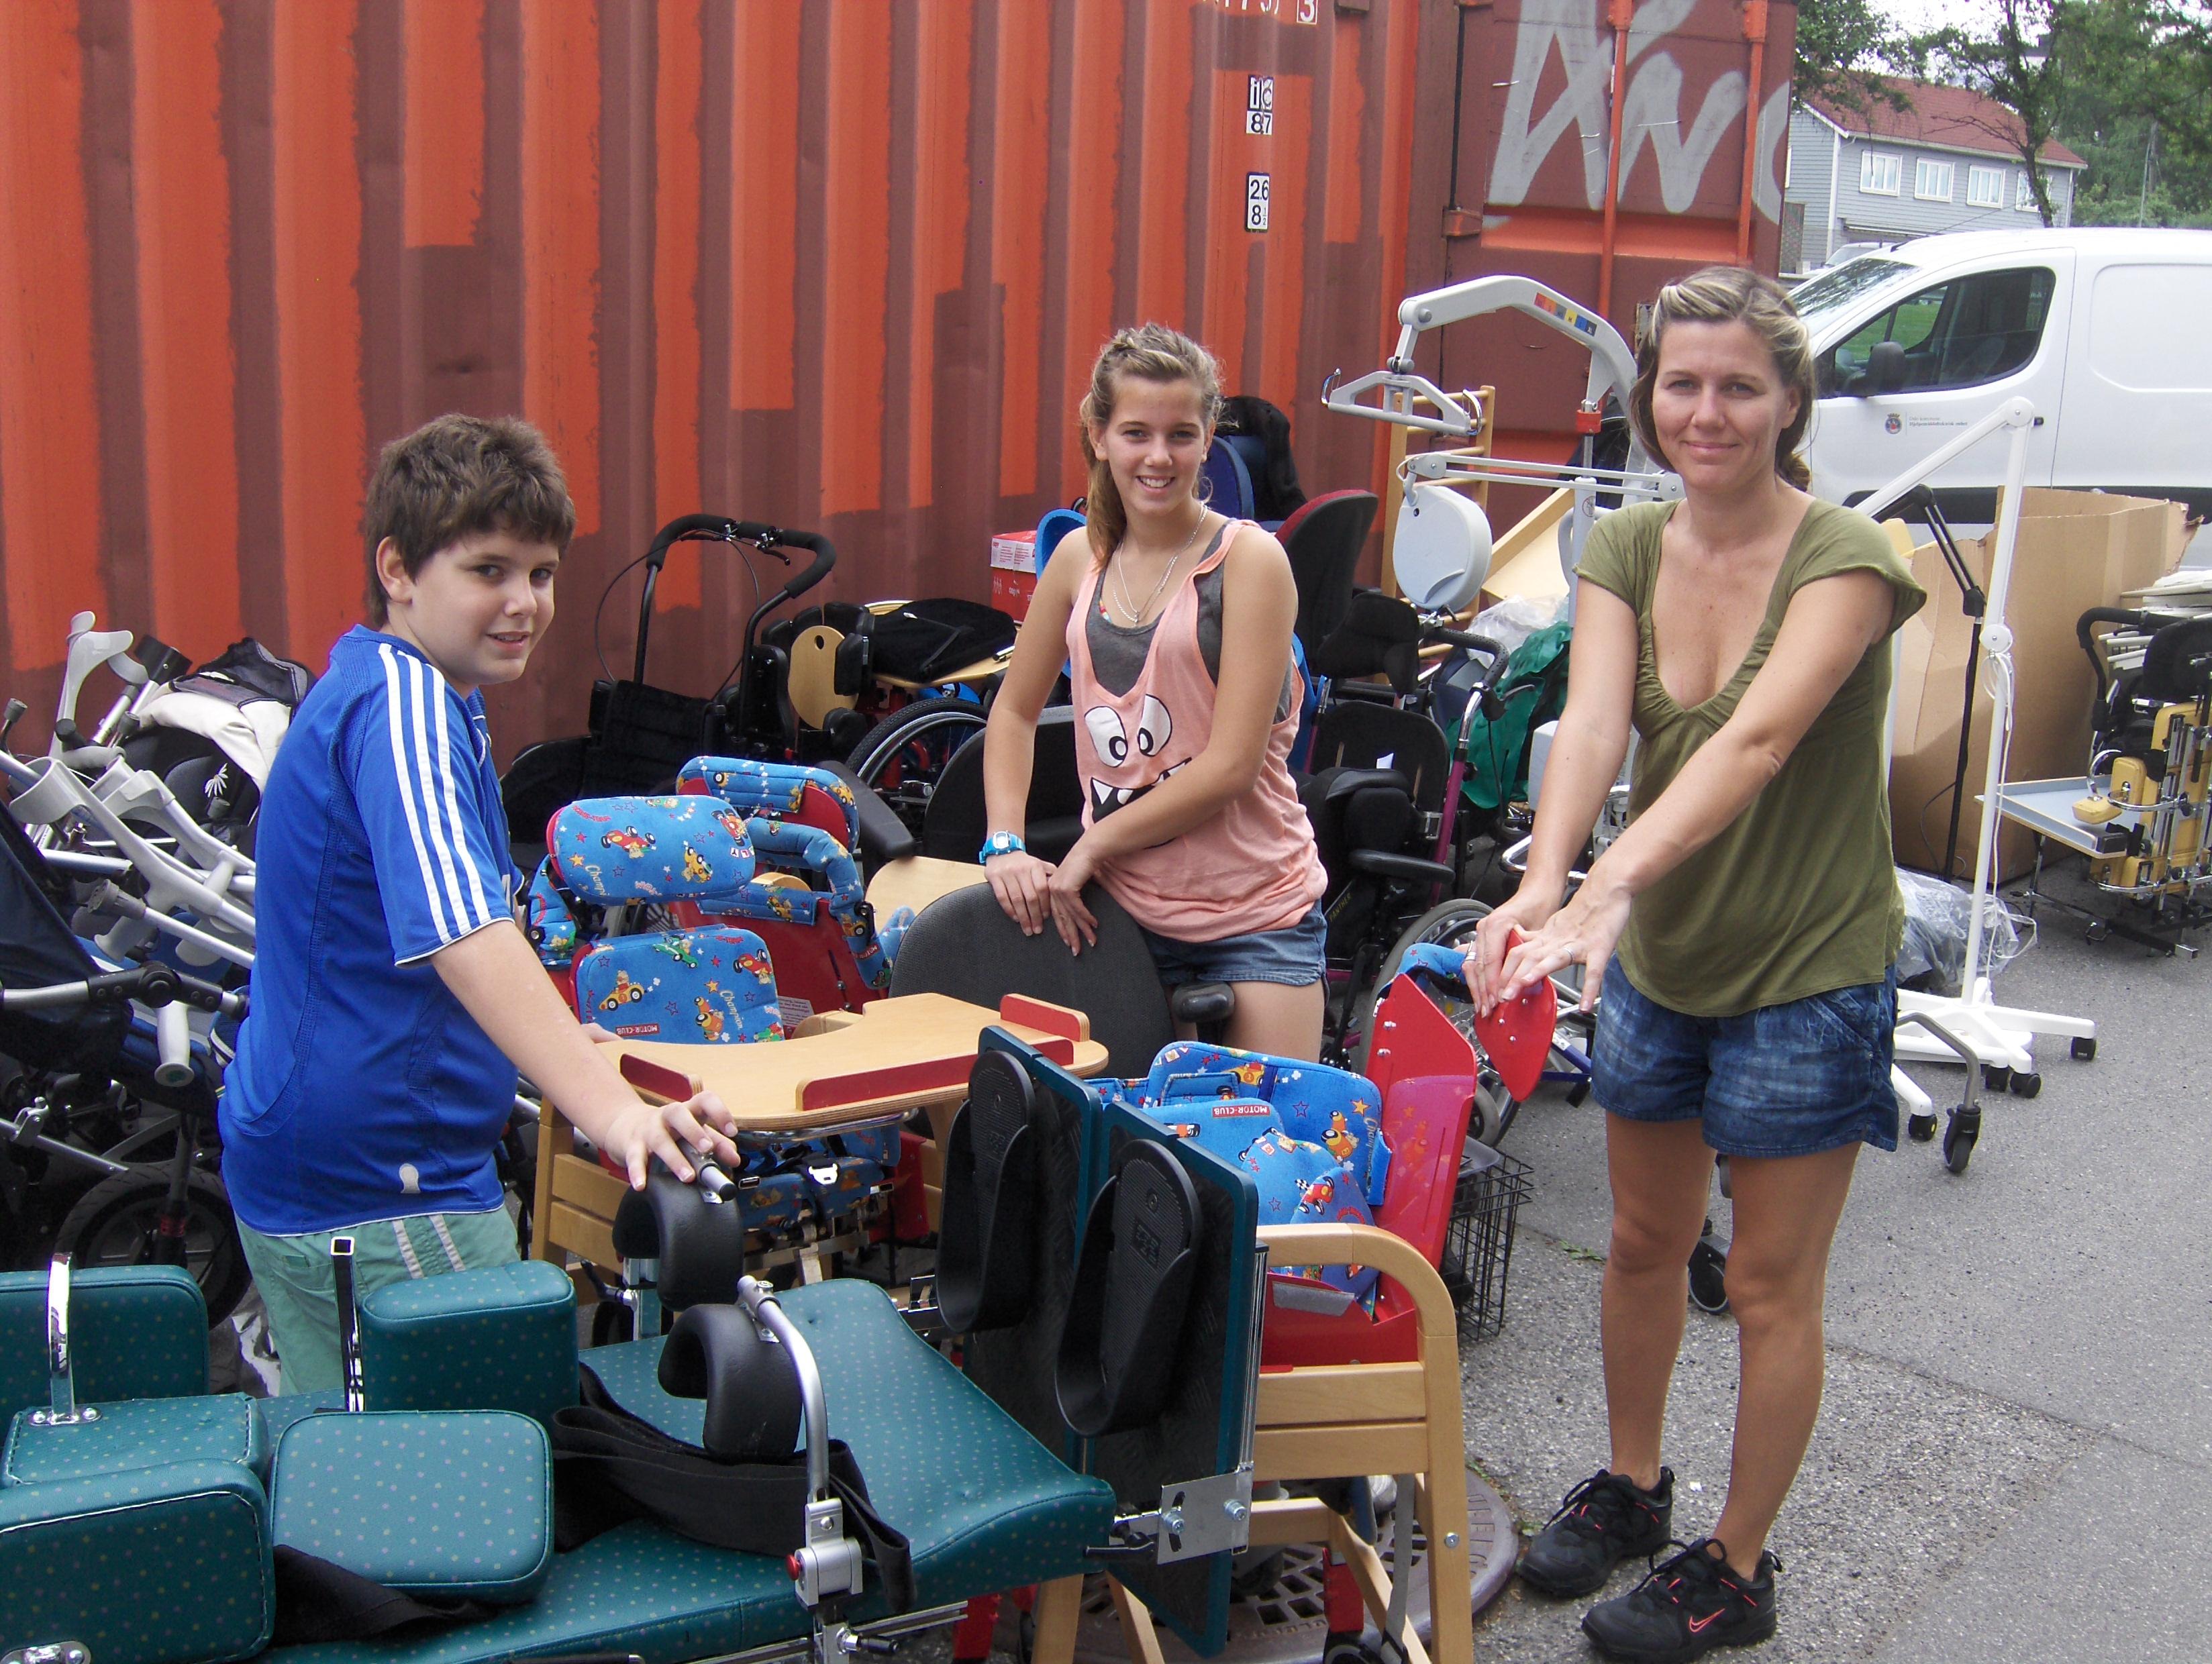 Marco, Luise og Cecilia